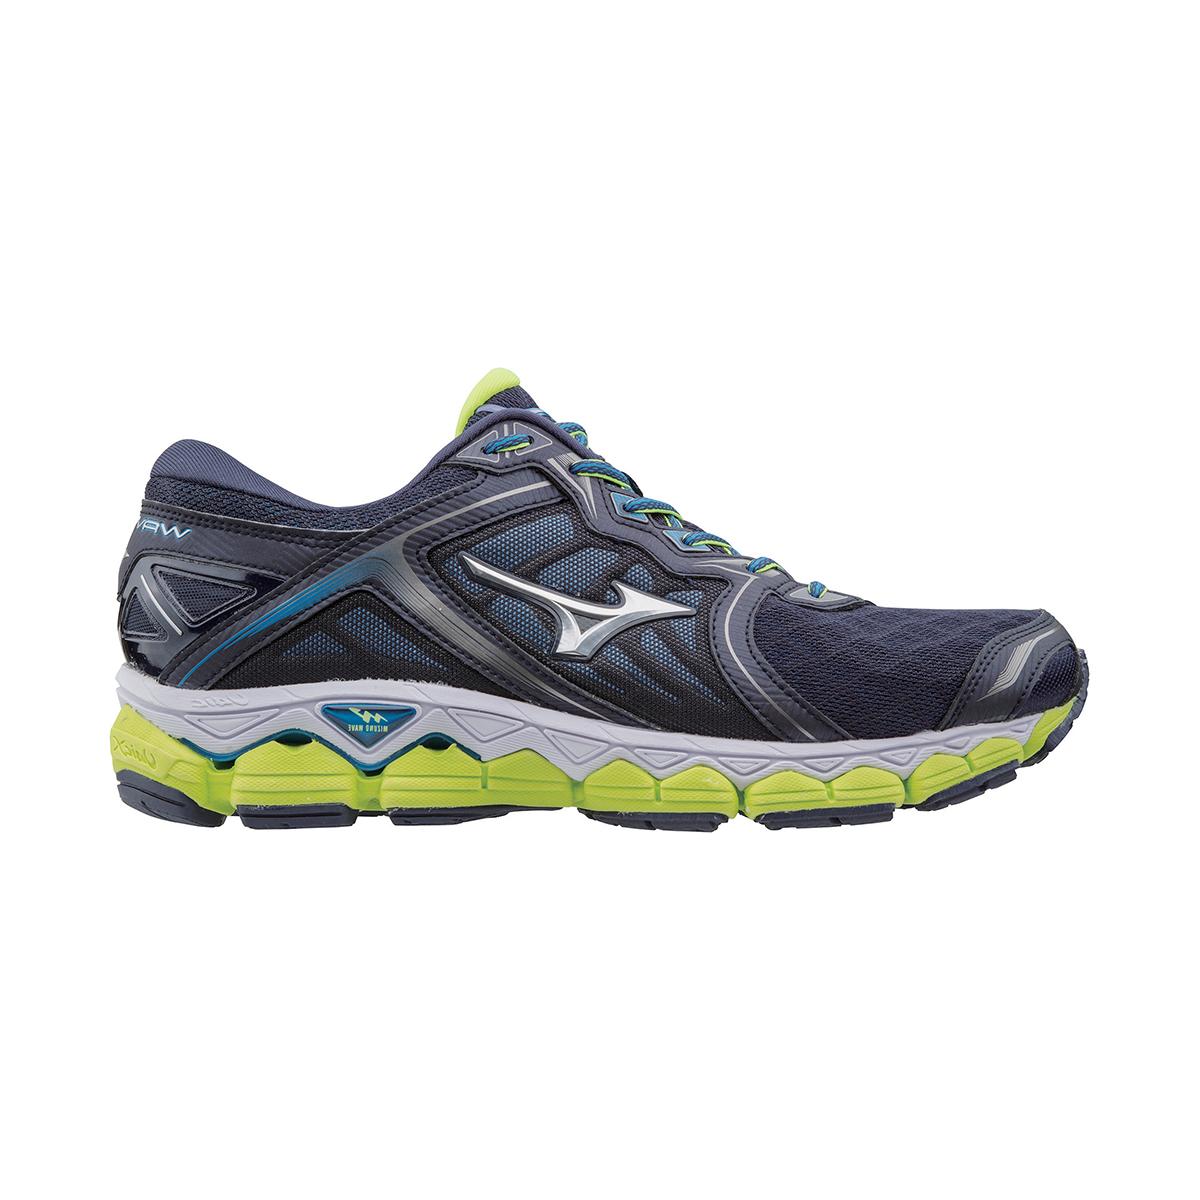 Mizuno Running Shoes For Plantar Fasciitis